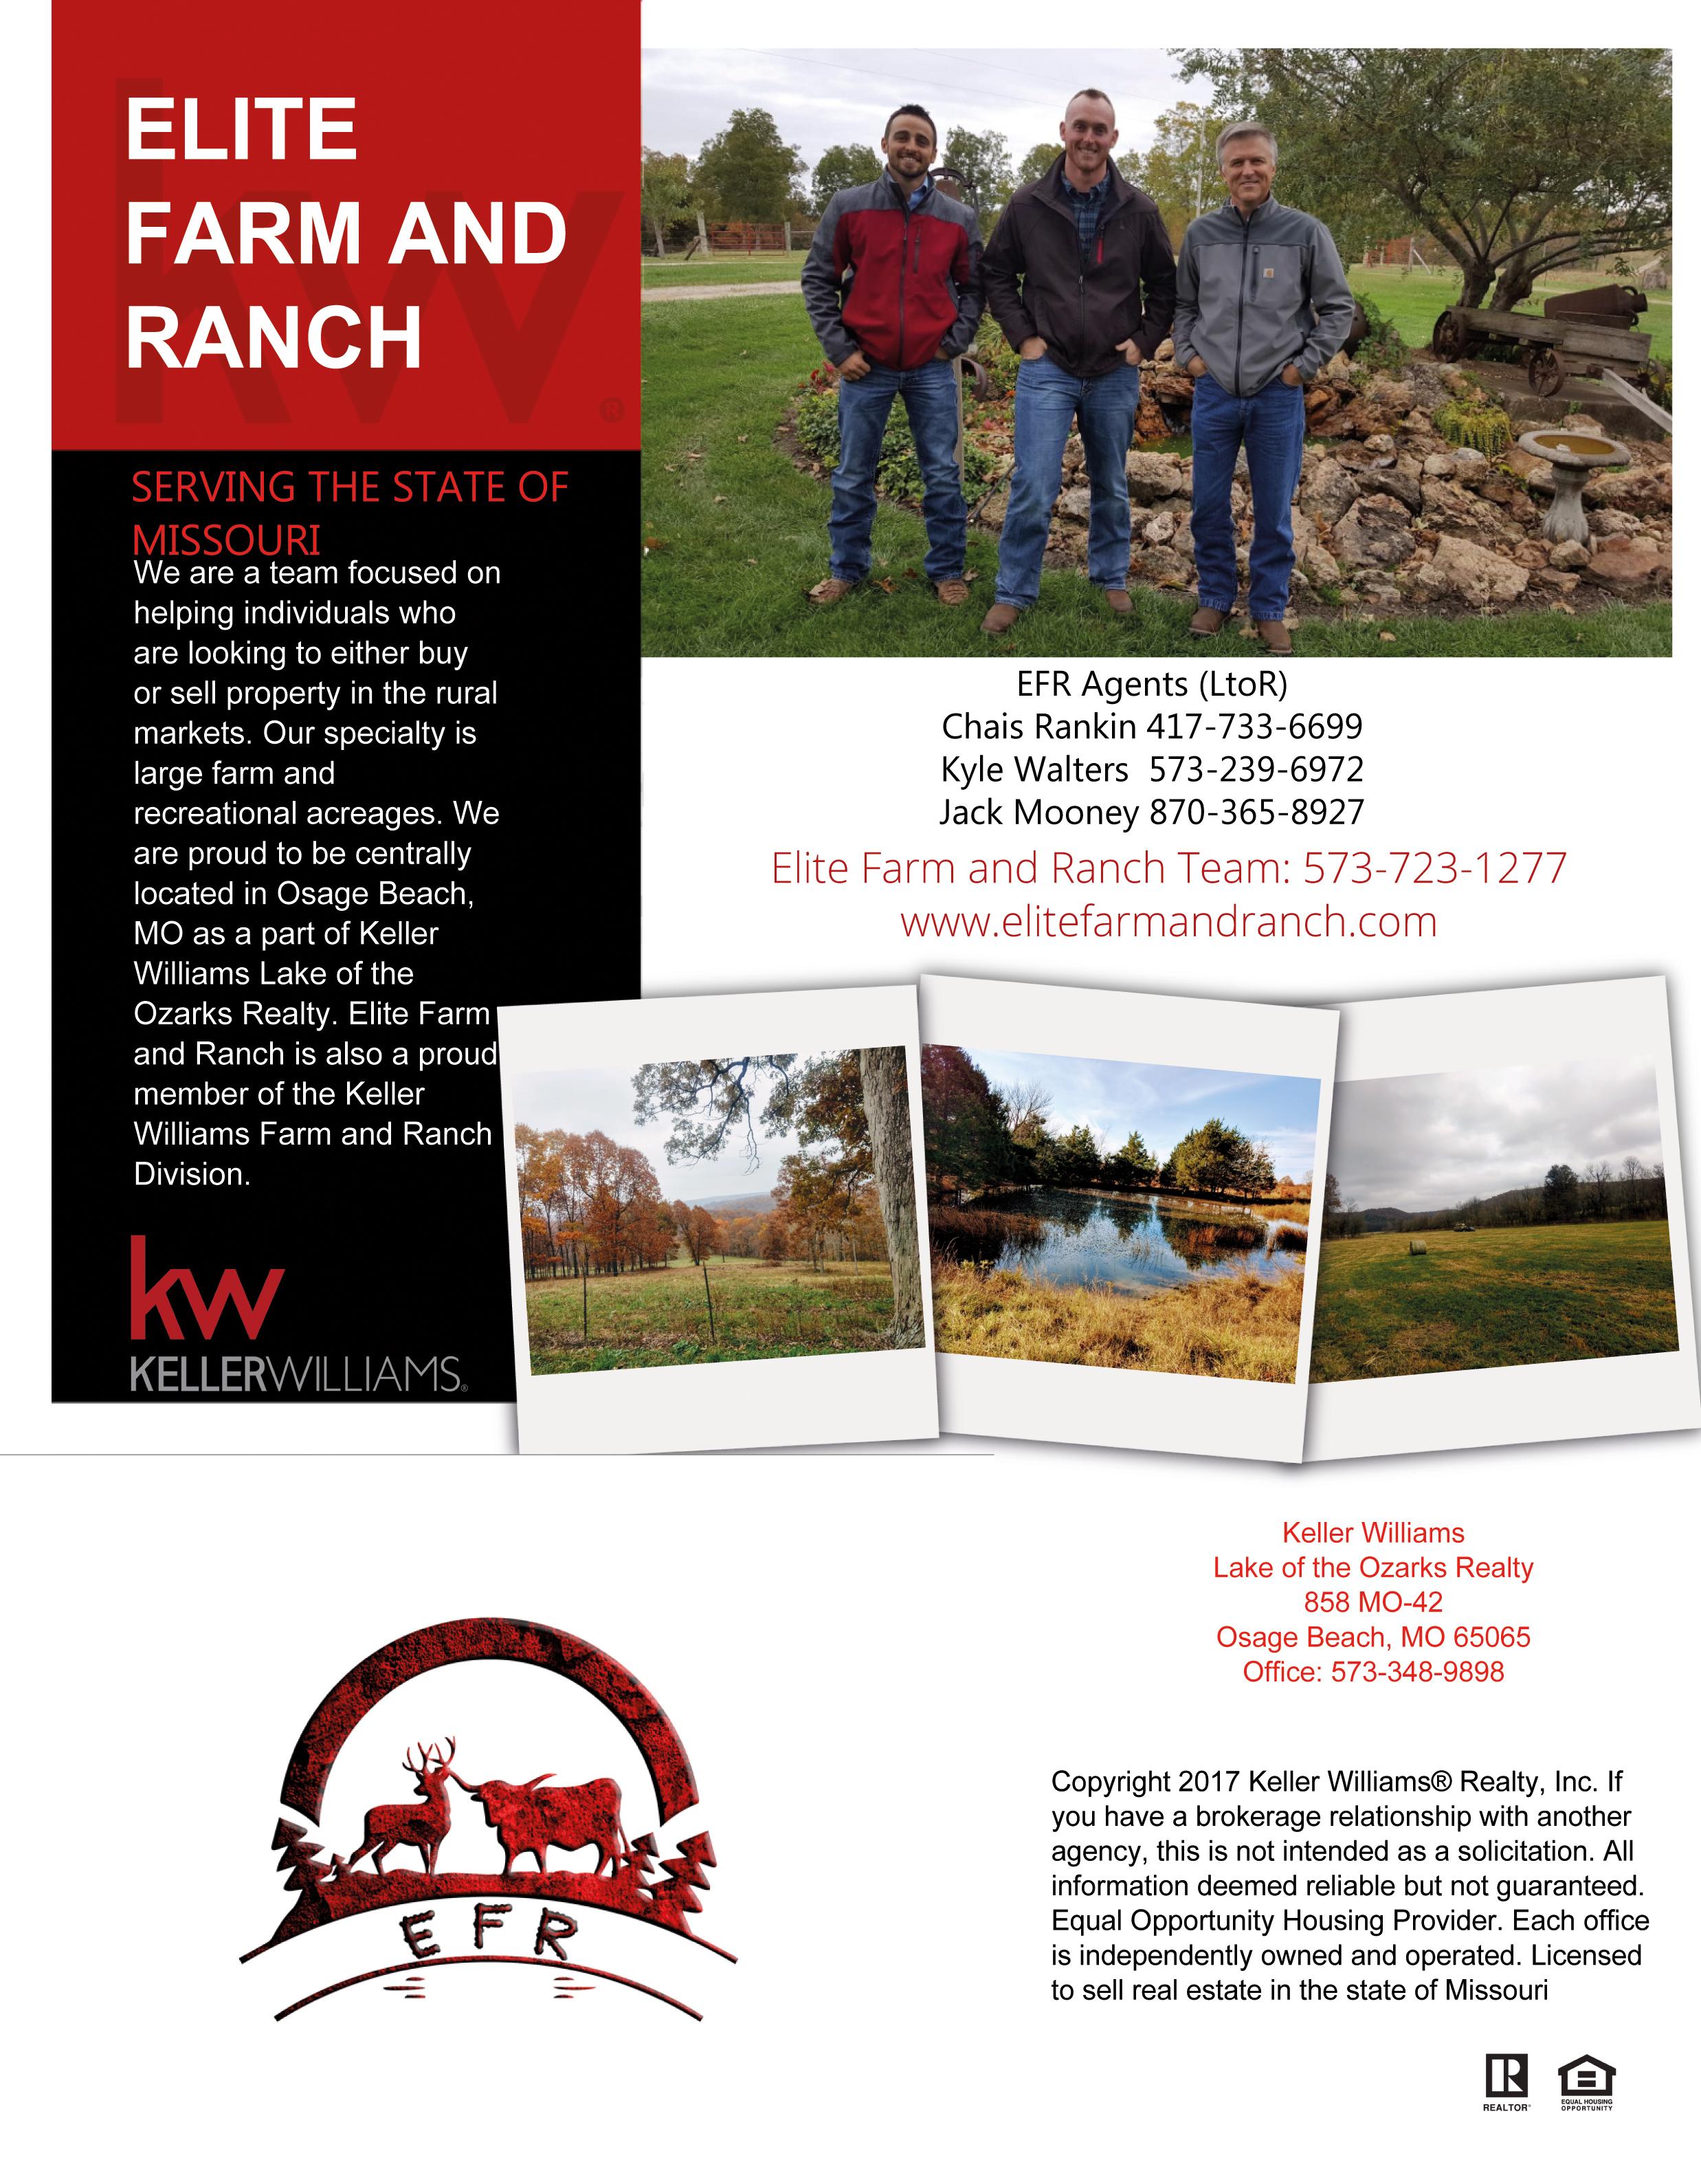 Central Missouri Elite Farm and Ranch Team